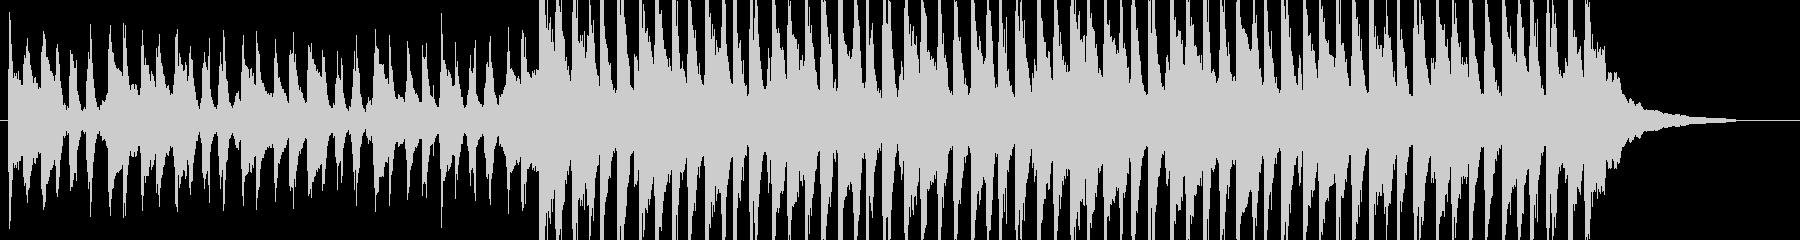 Happy Ukulele 1の未再生の波形